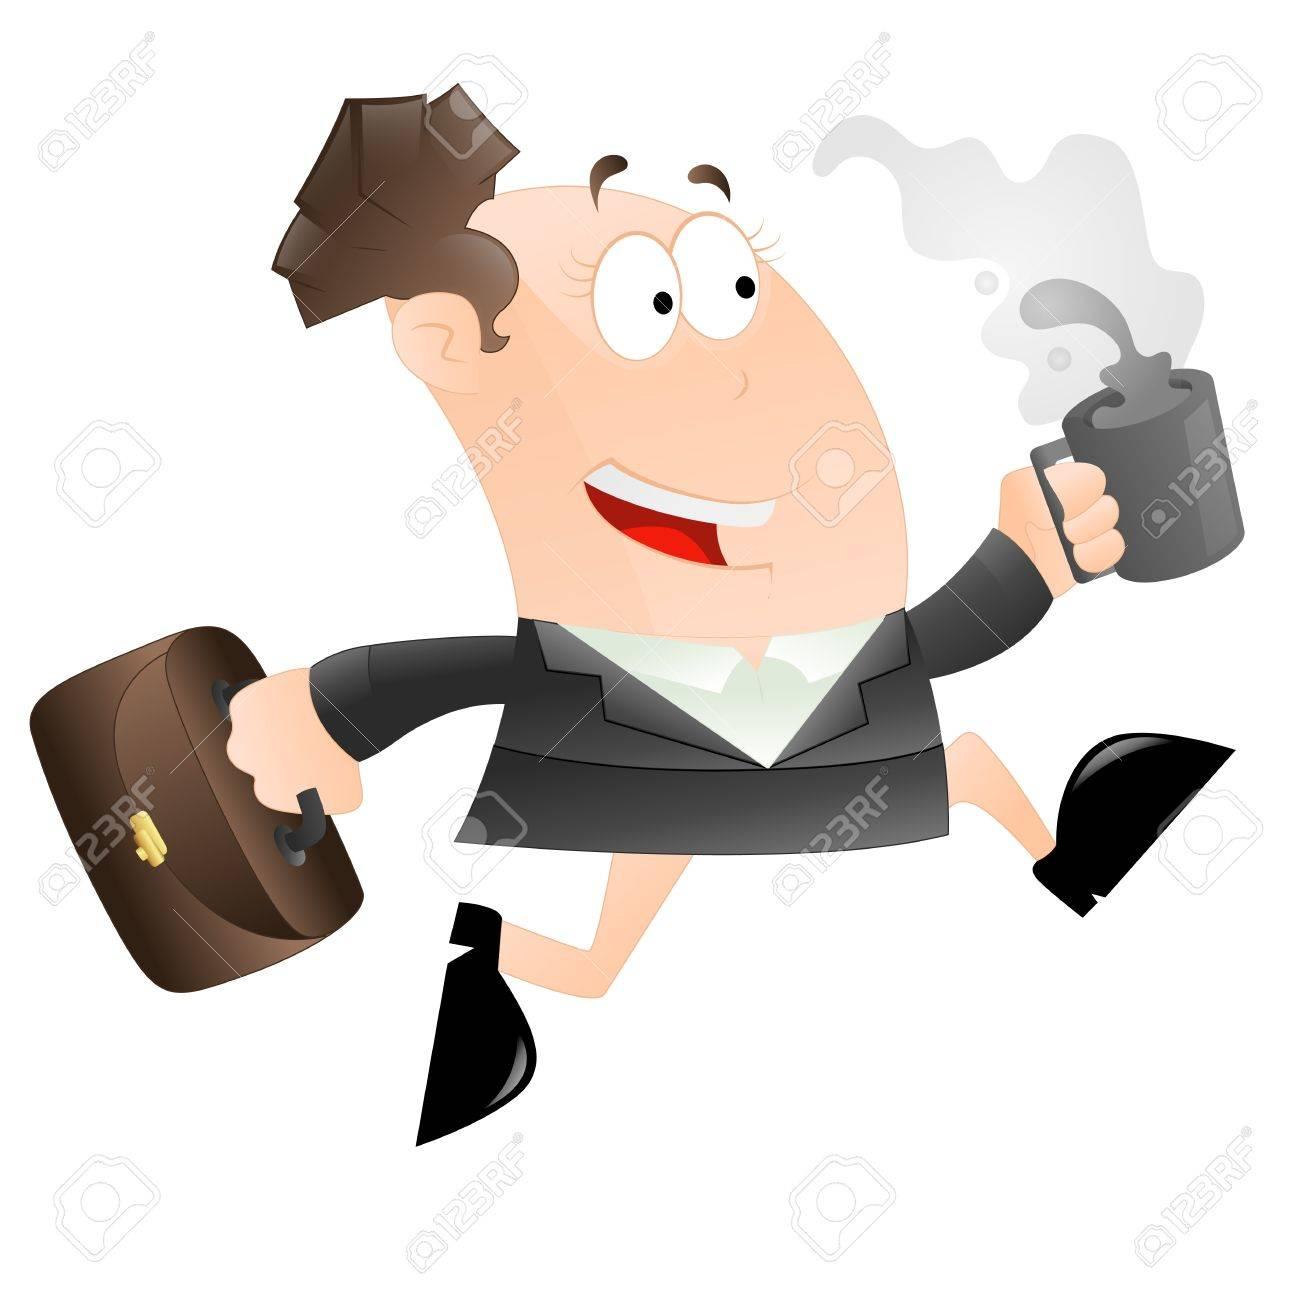 Running Business Woman Stock Vector - 12933563